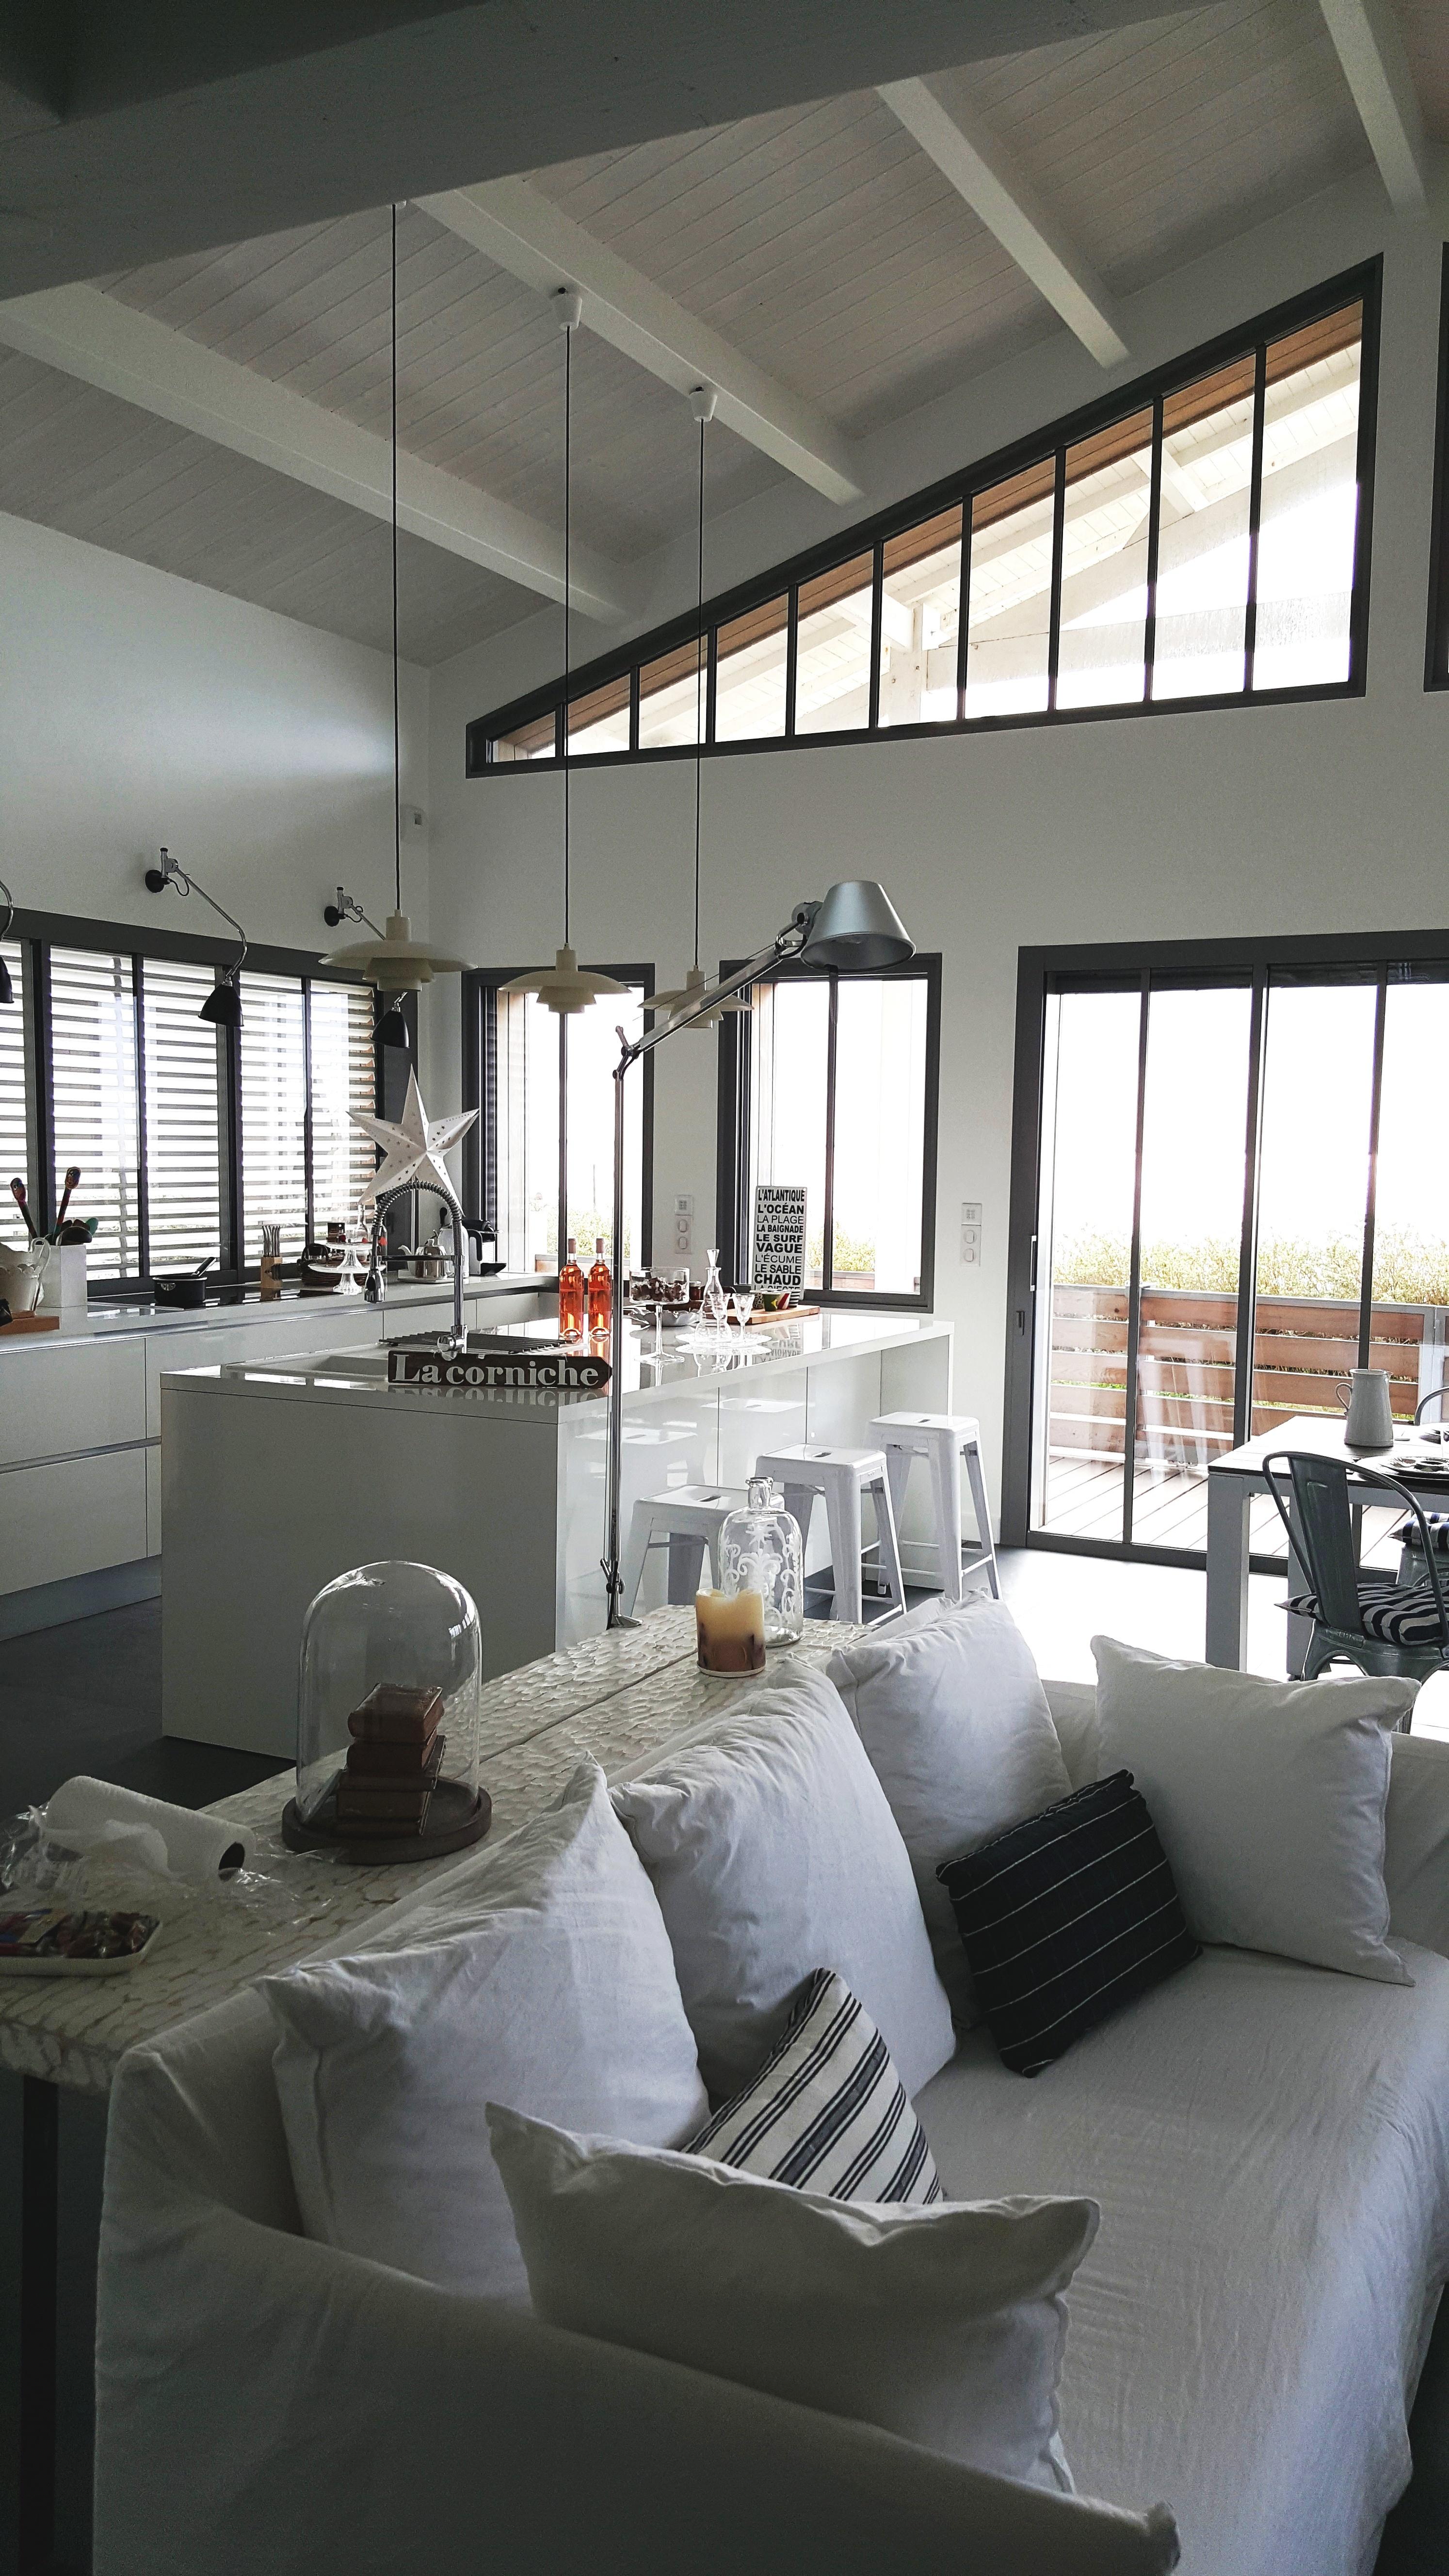 cuisine dml votre cuisiniste pornic cuisine dml. Black Bedroom Furniture Sets. Home Design Ideas